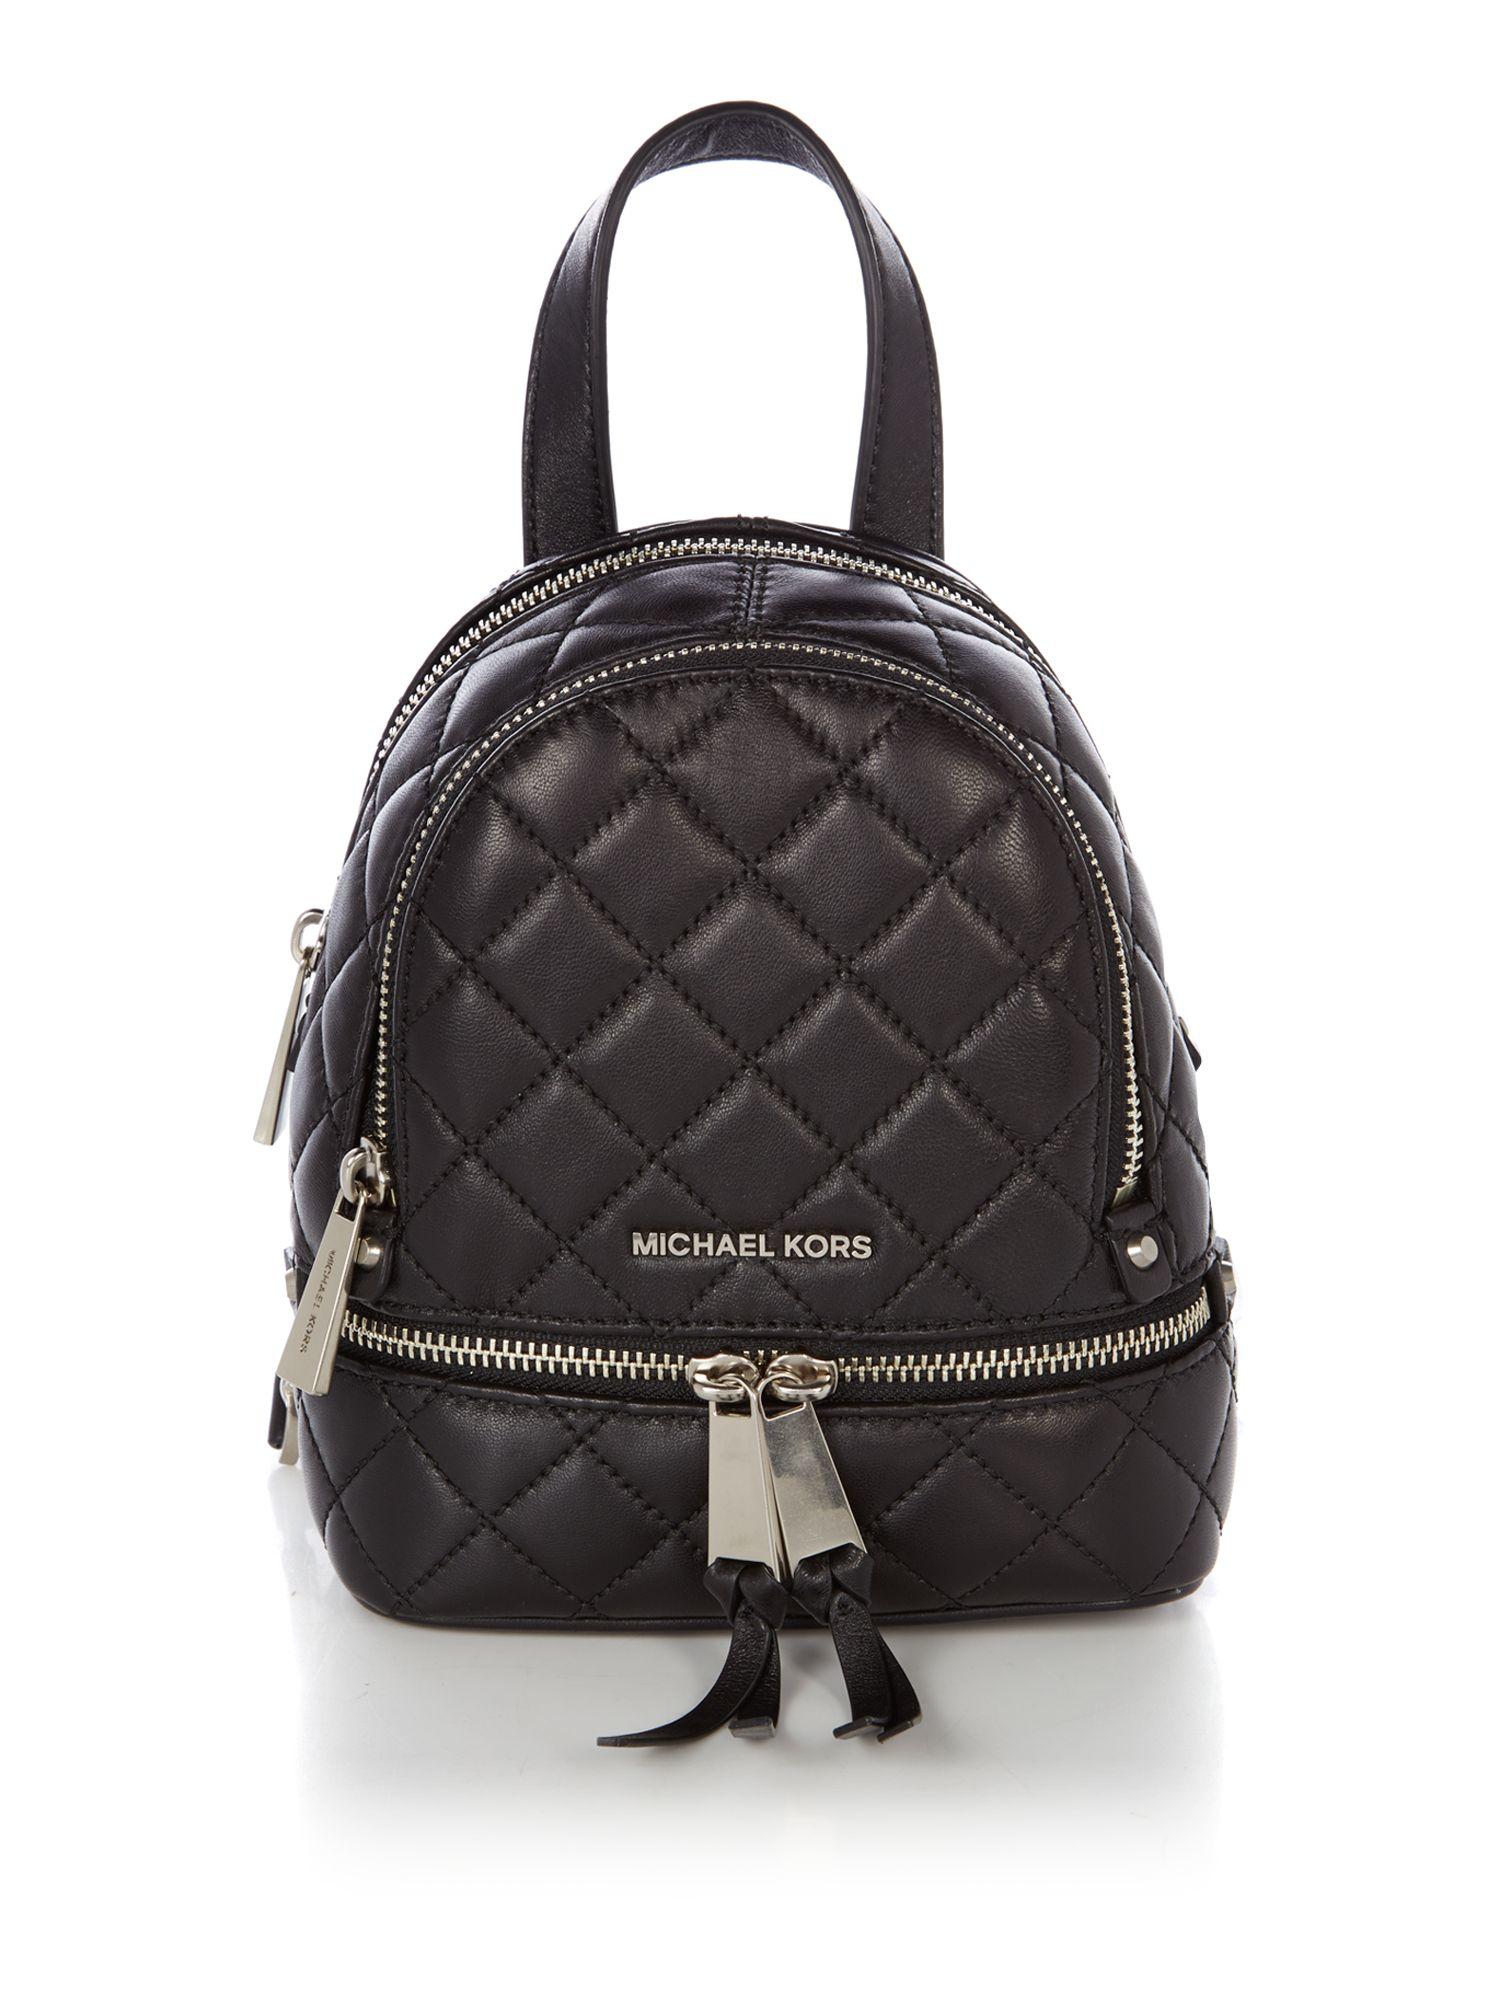 16755a1b6b11 spain michael kors rhea zip medium backpack in black lyst 2b204 0b032